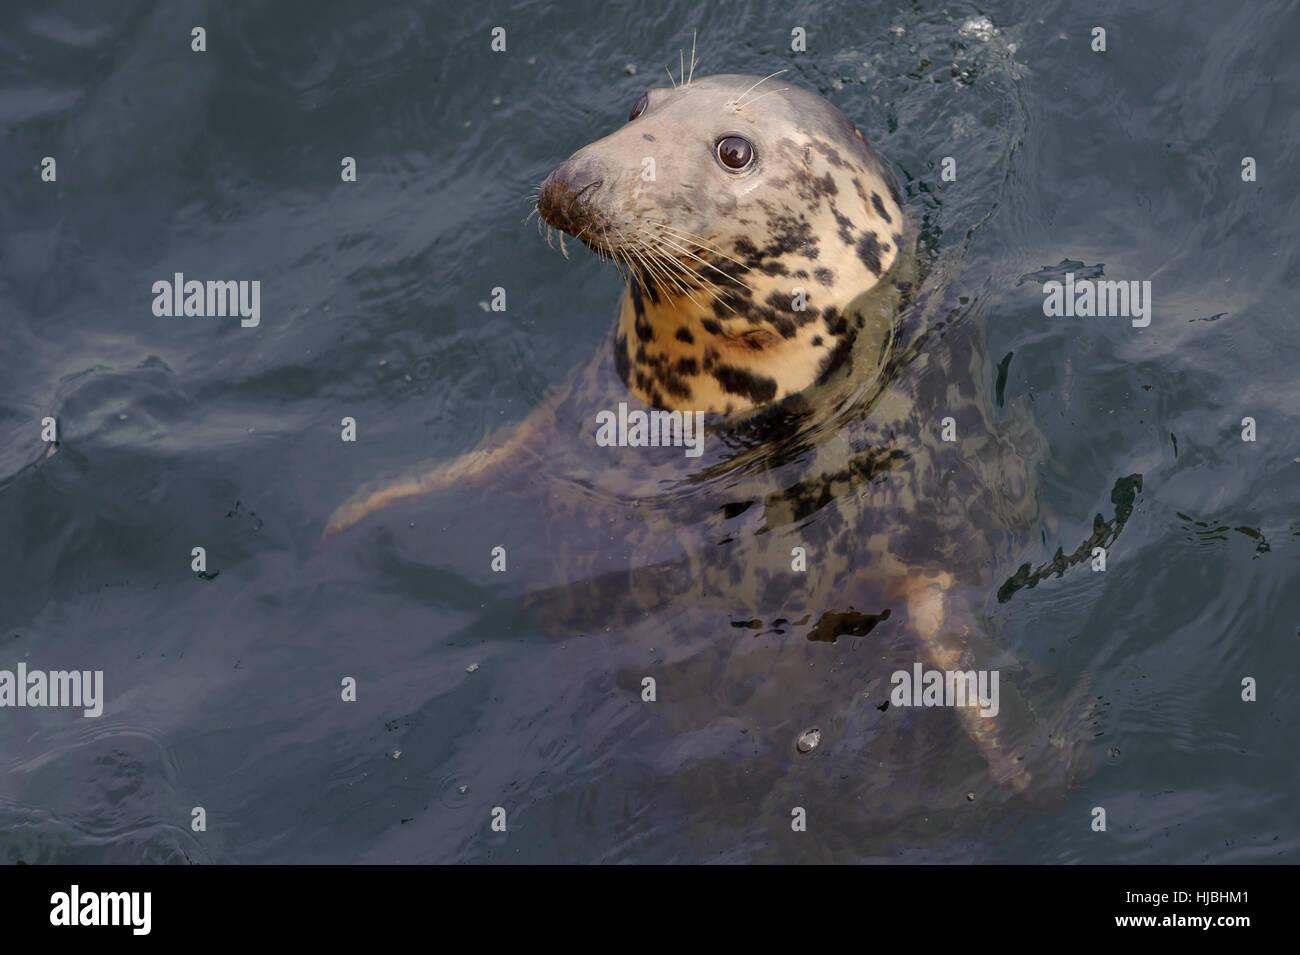 Atlantic grey seal (Halichoerus grypus) in Lerwick harbour, Shetland Isles. October 2012. Stock Photo